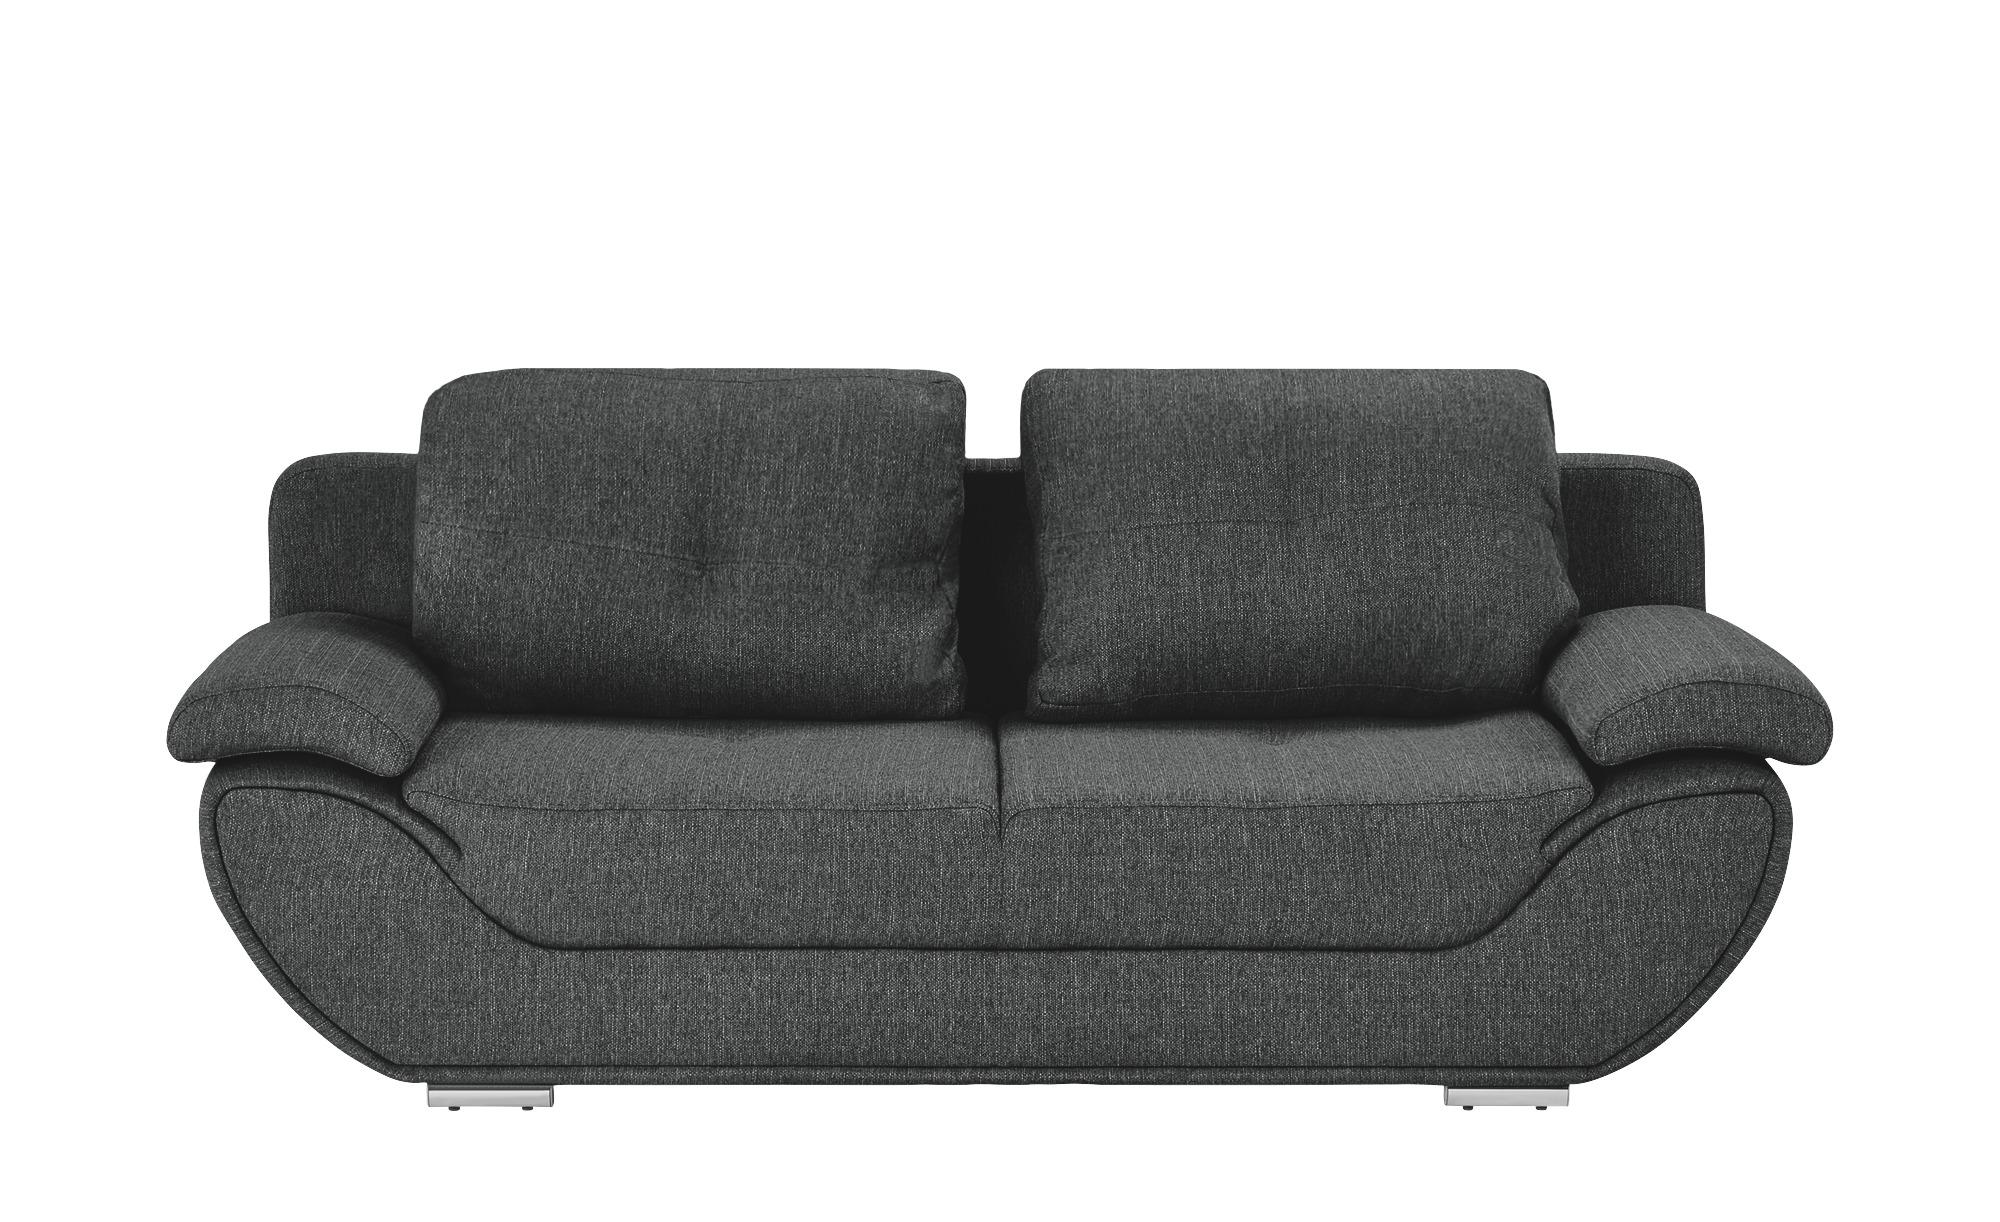 smart Design-Schlafsofa braun - Webstoff Adina ¦ grau ¦ Maße (cm): B: 204 H: 90 T: 92 Polstermöbel > Sofas > 2-Sitzer - Höffner